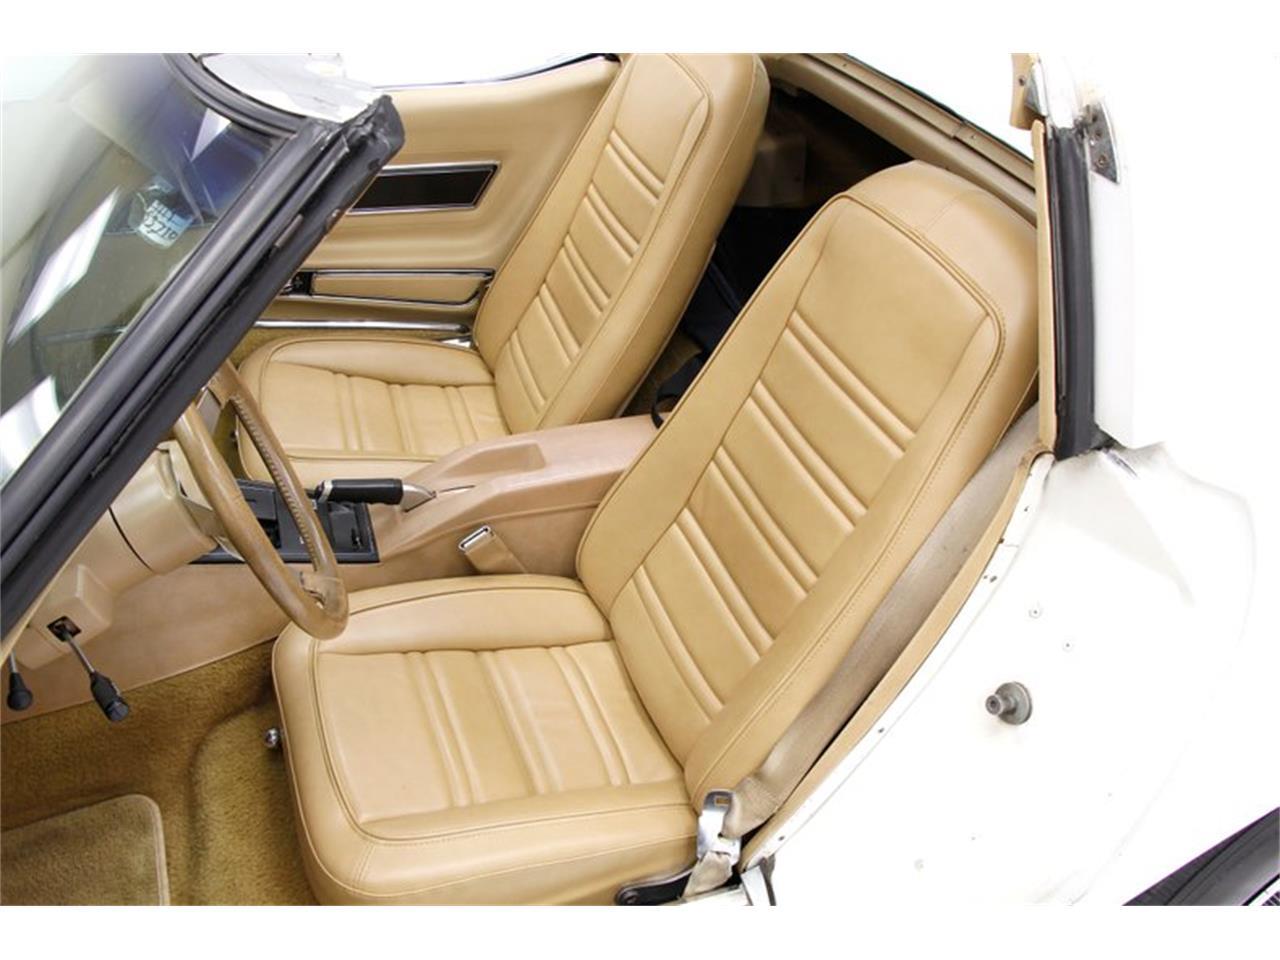 1977 Chevrolet Corvette (CC-1323033) for sale in Morgantown, Pennsylvania